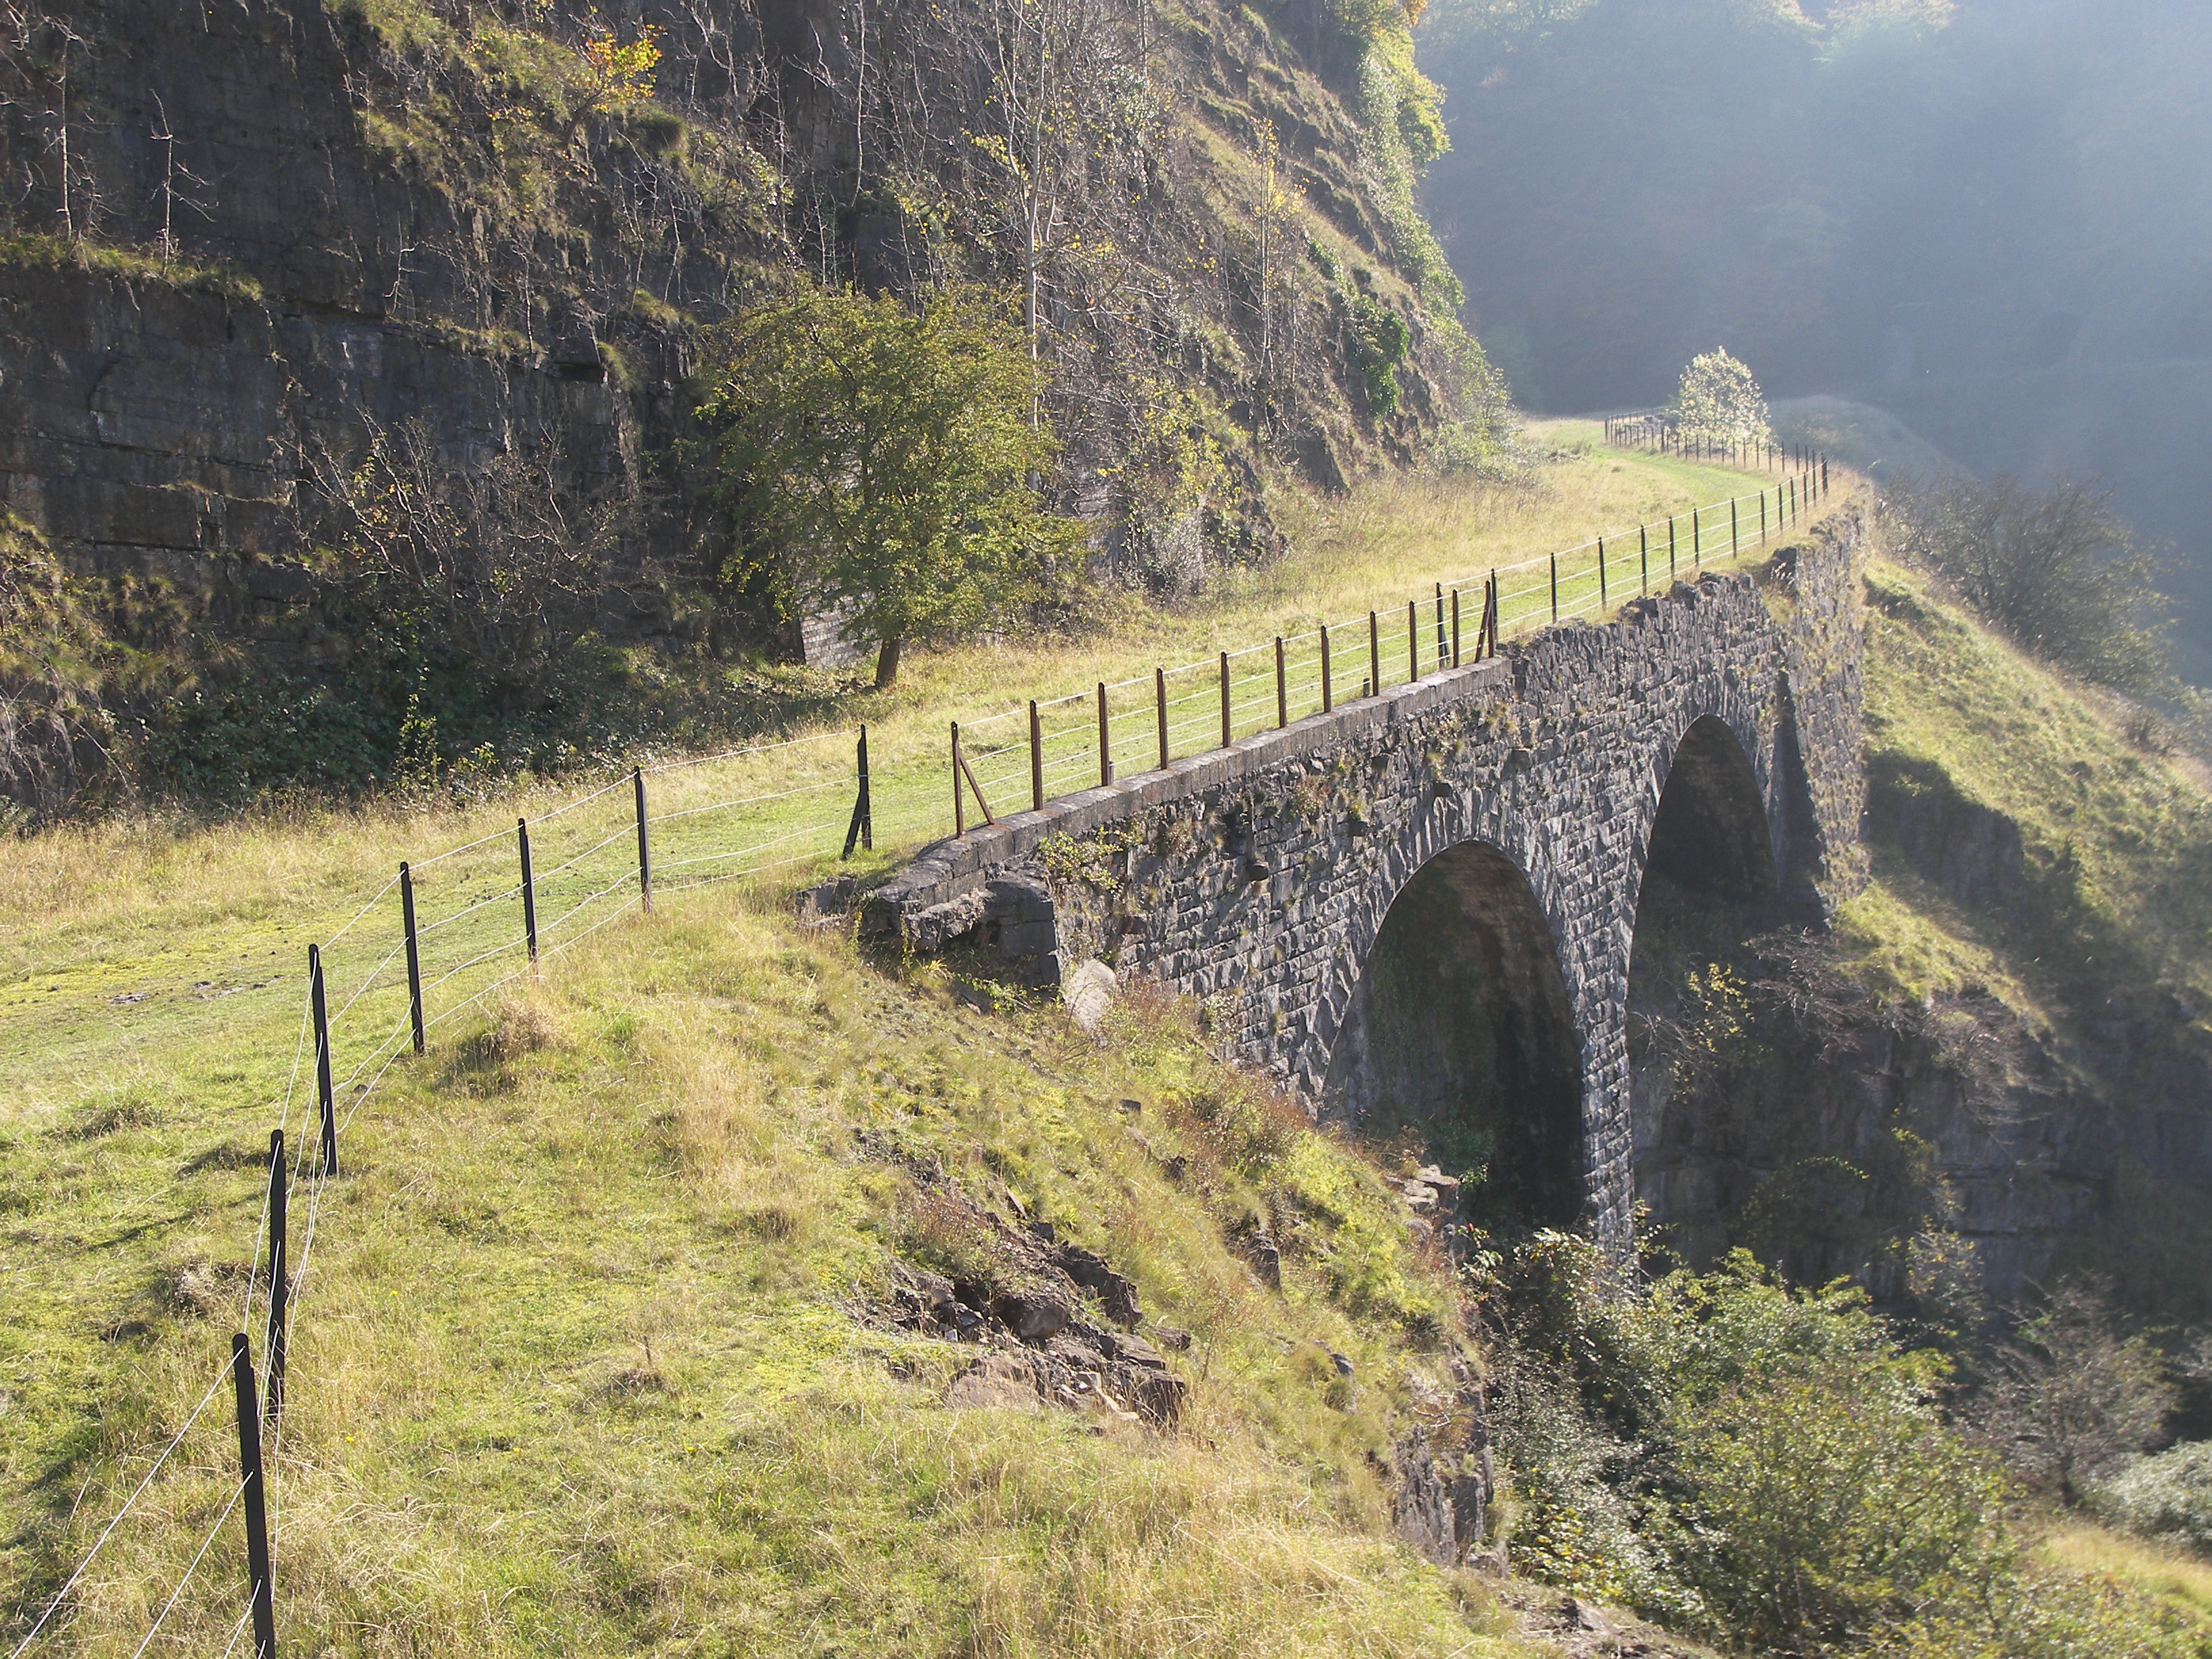 Clydach Gorge